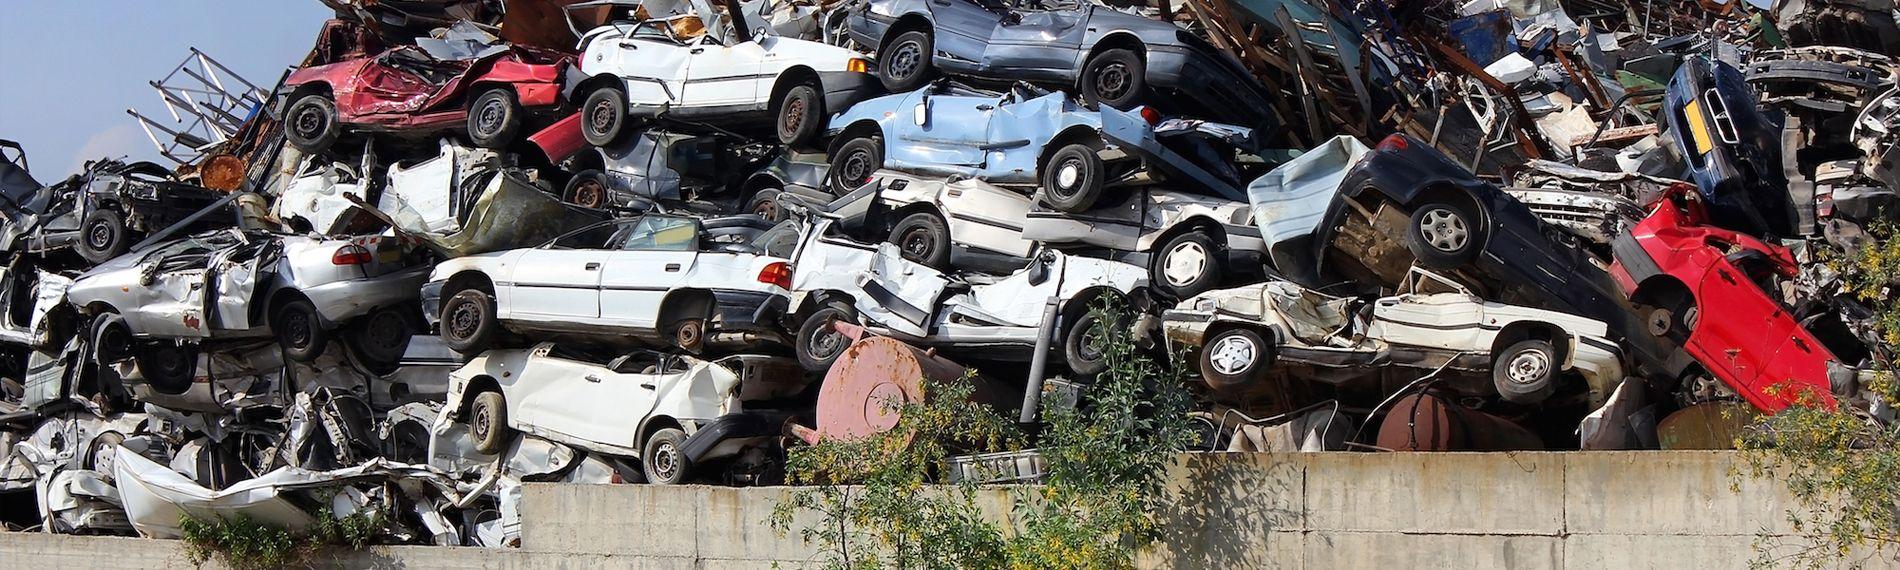 1 Car & Auto Wreckers Melbourne, Best Car Removal Service